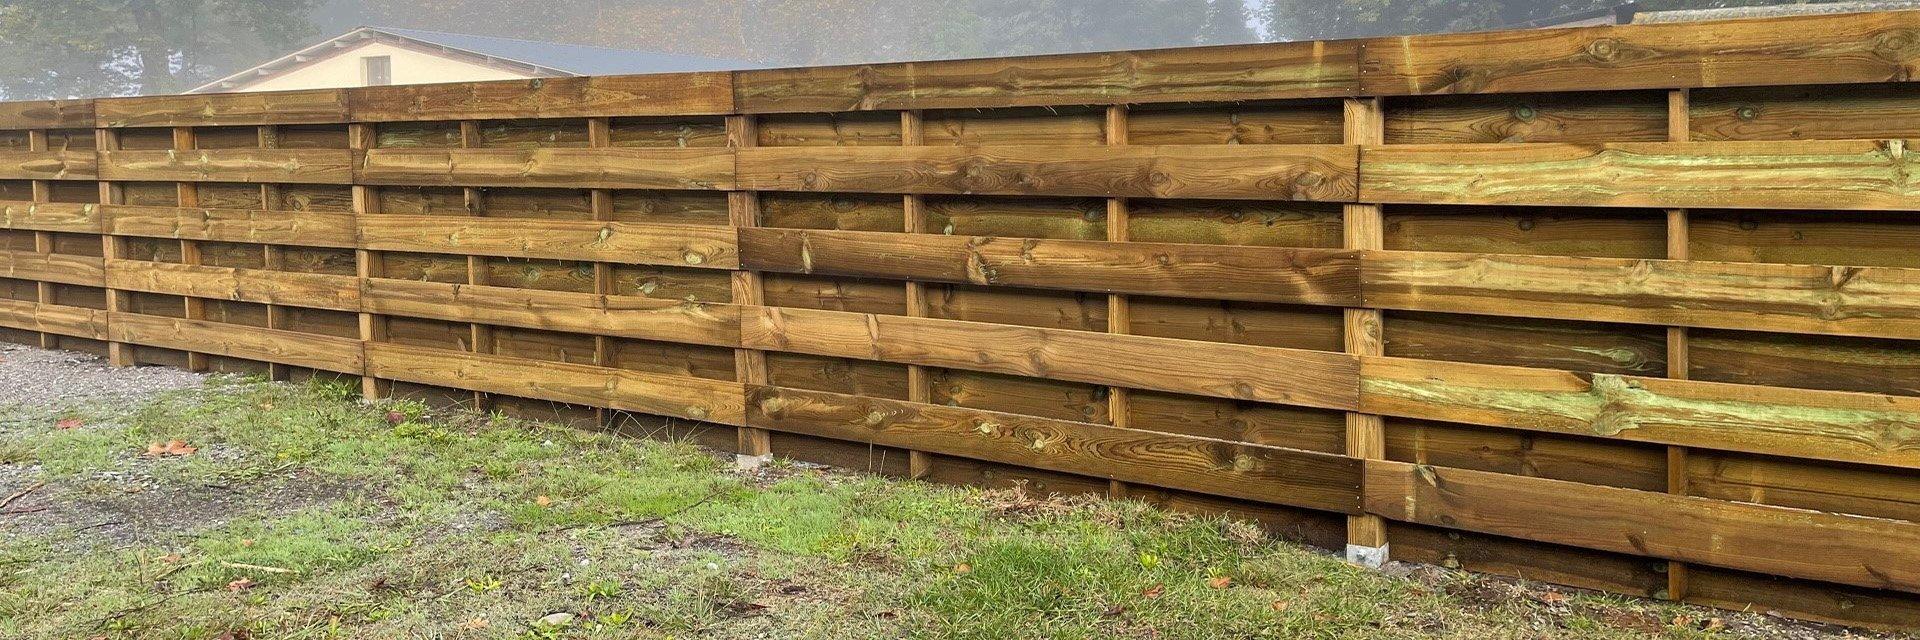 idea bois nicolas terrasse bois cl ture jardin et rondin de bois. Black Bedroom Furniture Sets. Home Design Ideas